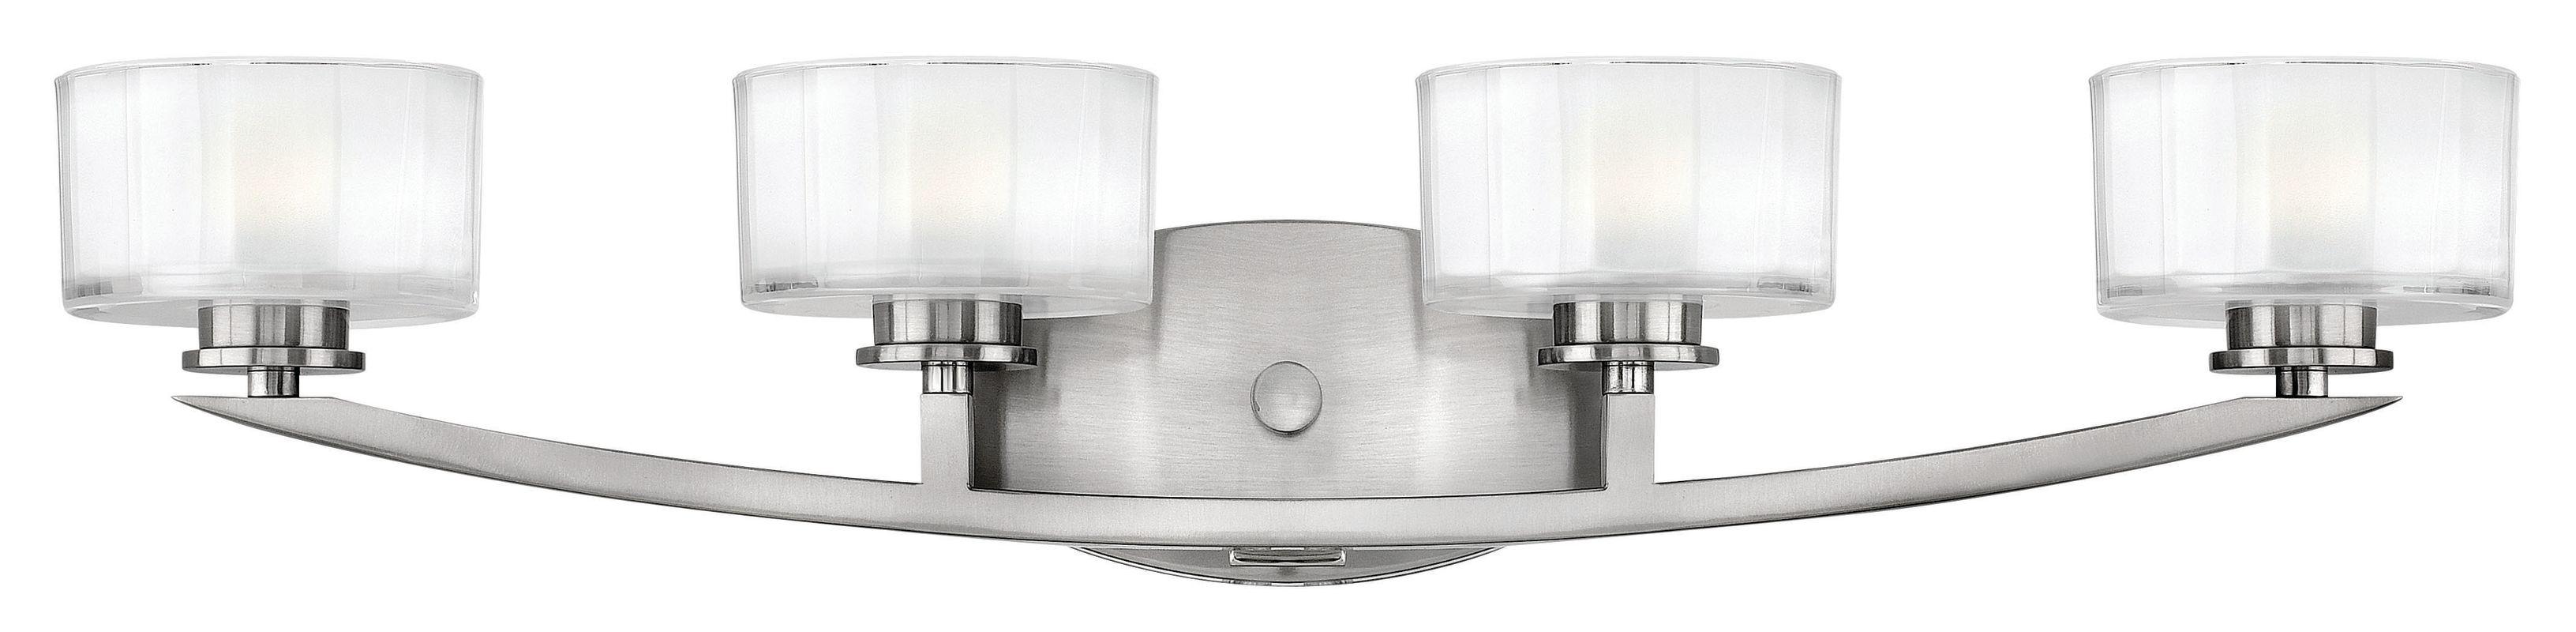 Hinkley 5594BN Brushed Nickel Contemporary Meridian Bathroom Light